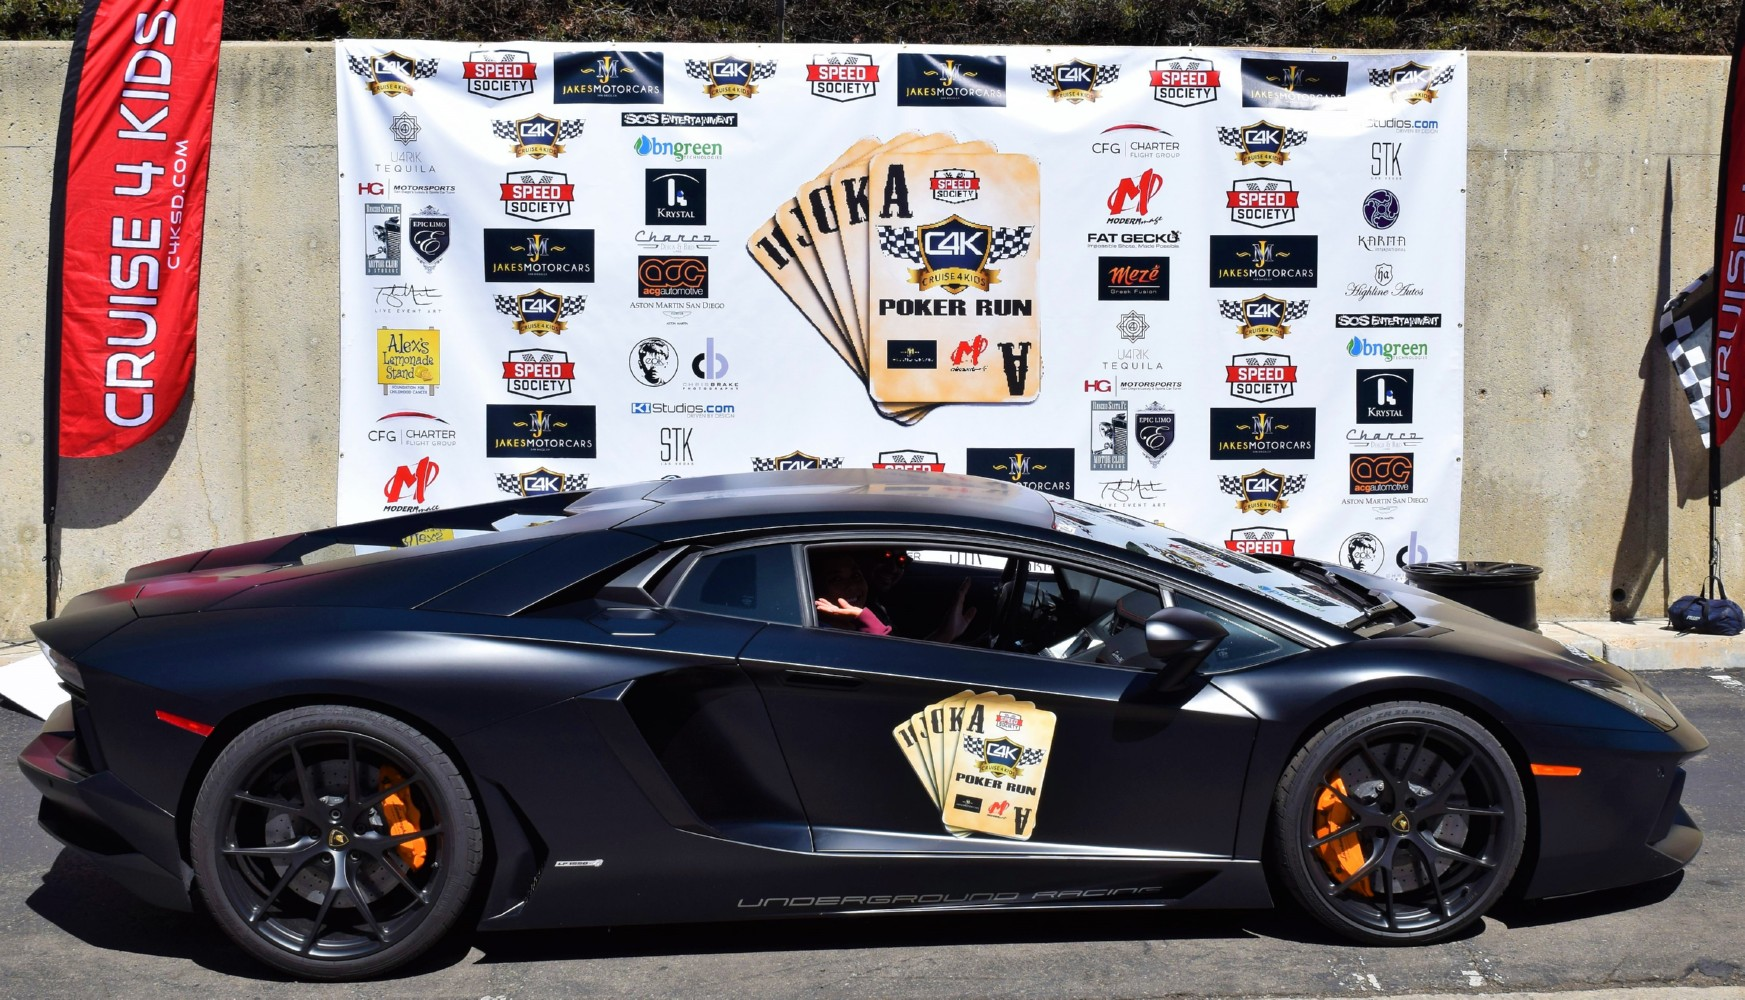 Poker Run 2017 Banner Photos - 24.jpg